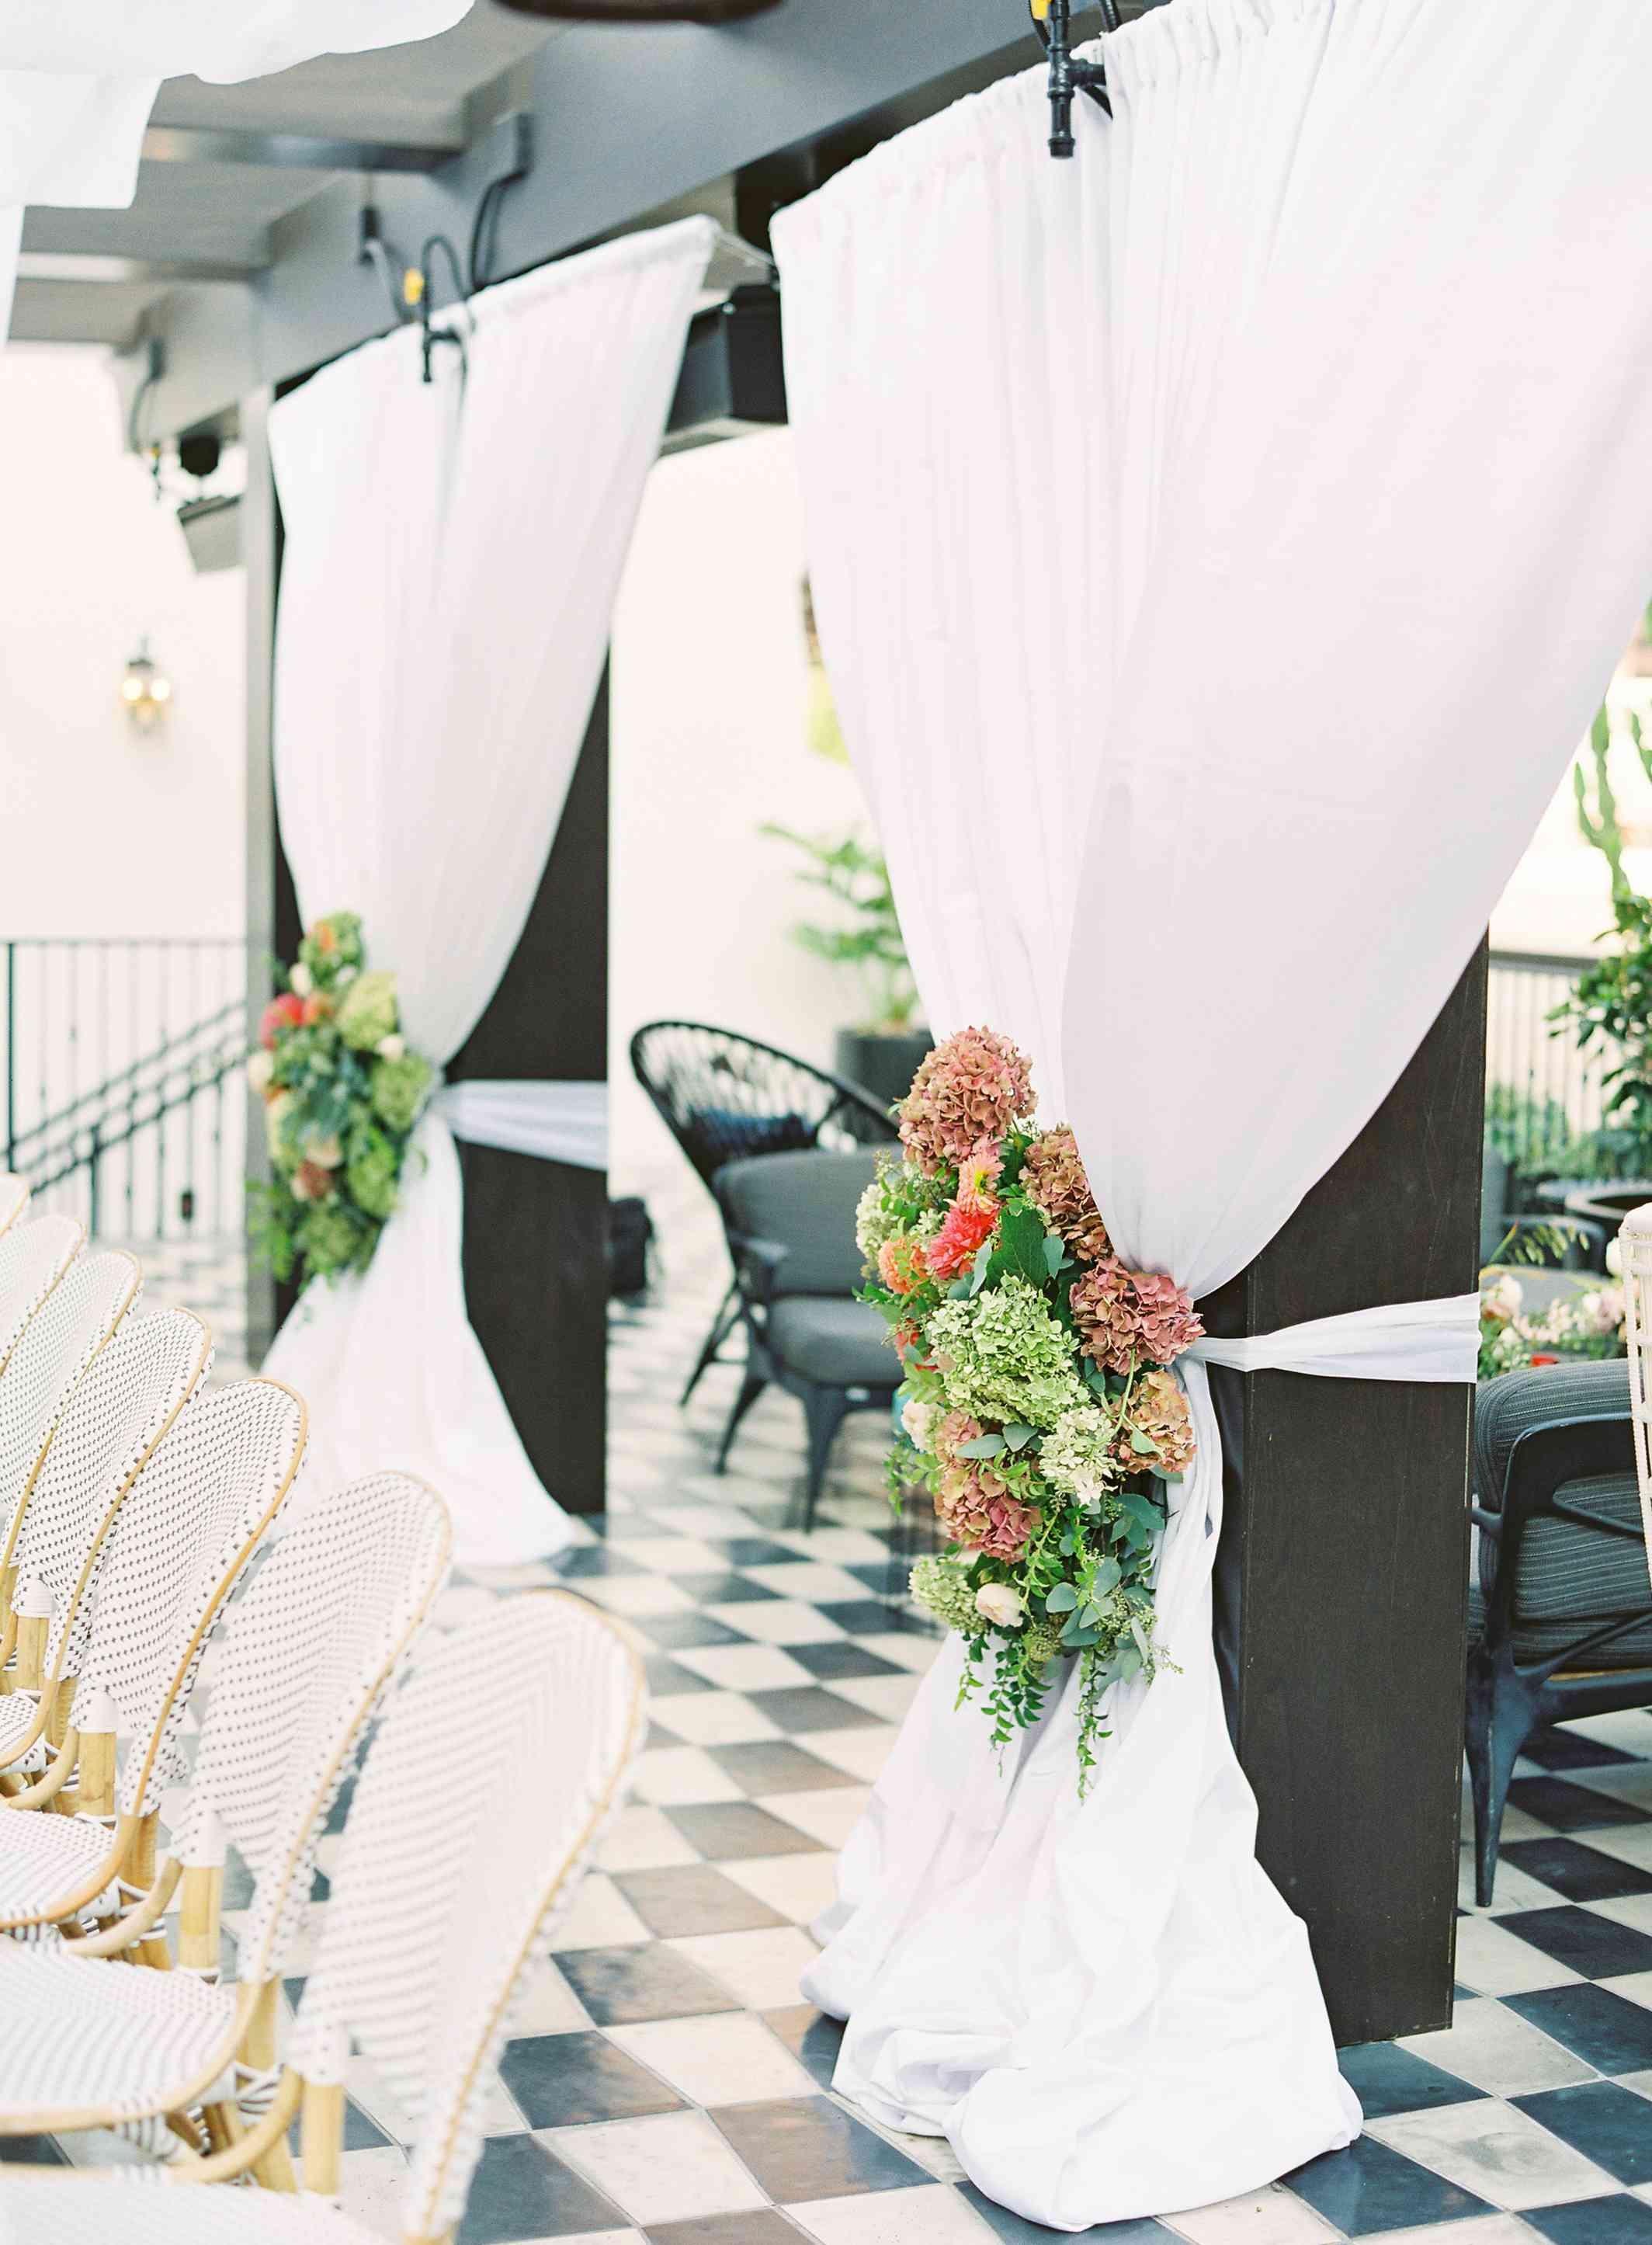 Fabric decorates reception venue